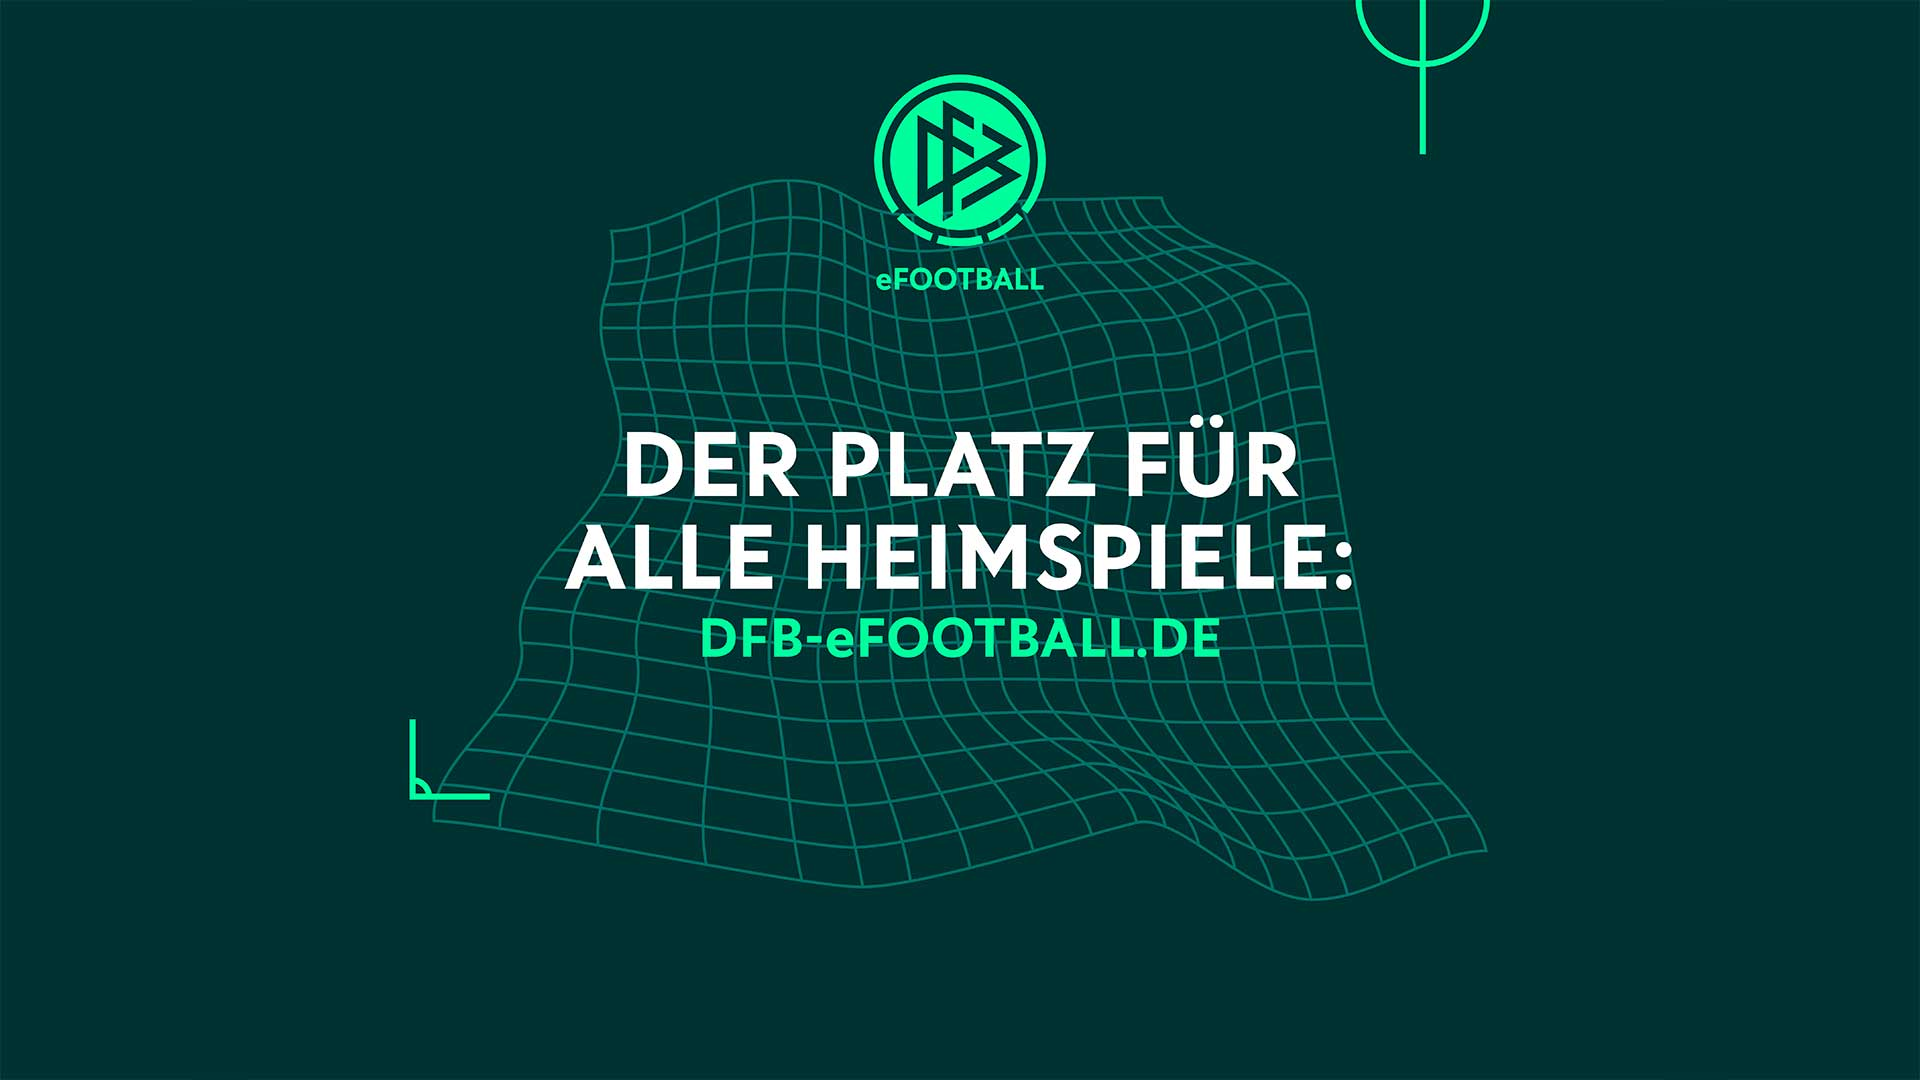 200325 DFB eFootball PM 17 Allgemein babt